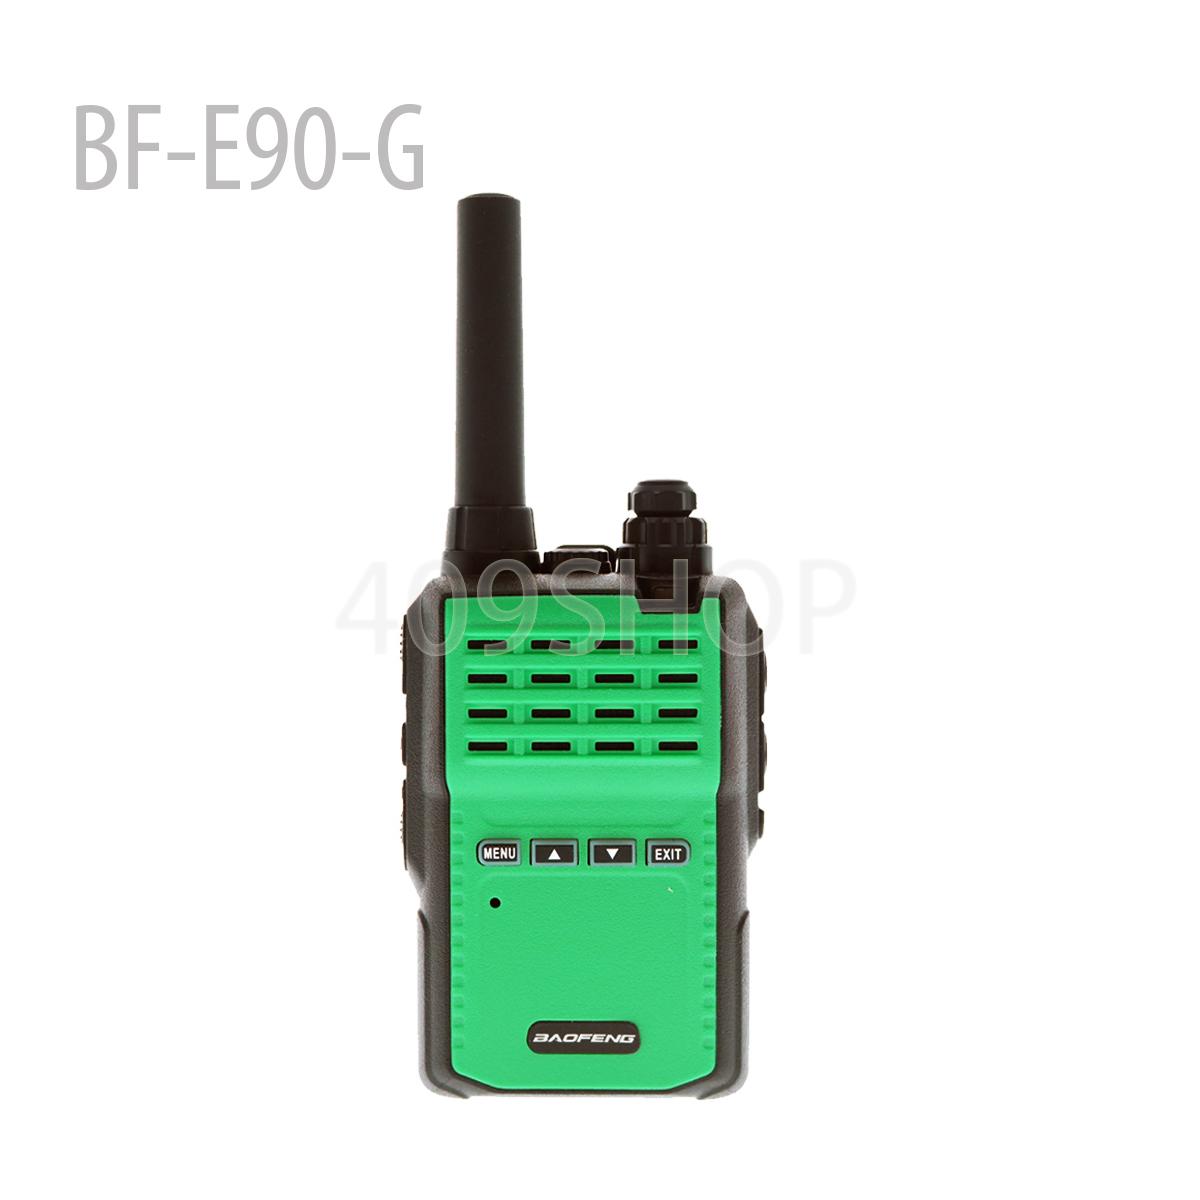 BAOFENG BF-E90-G Mini Two Way Radio UHF 400-470 MHZGreen